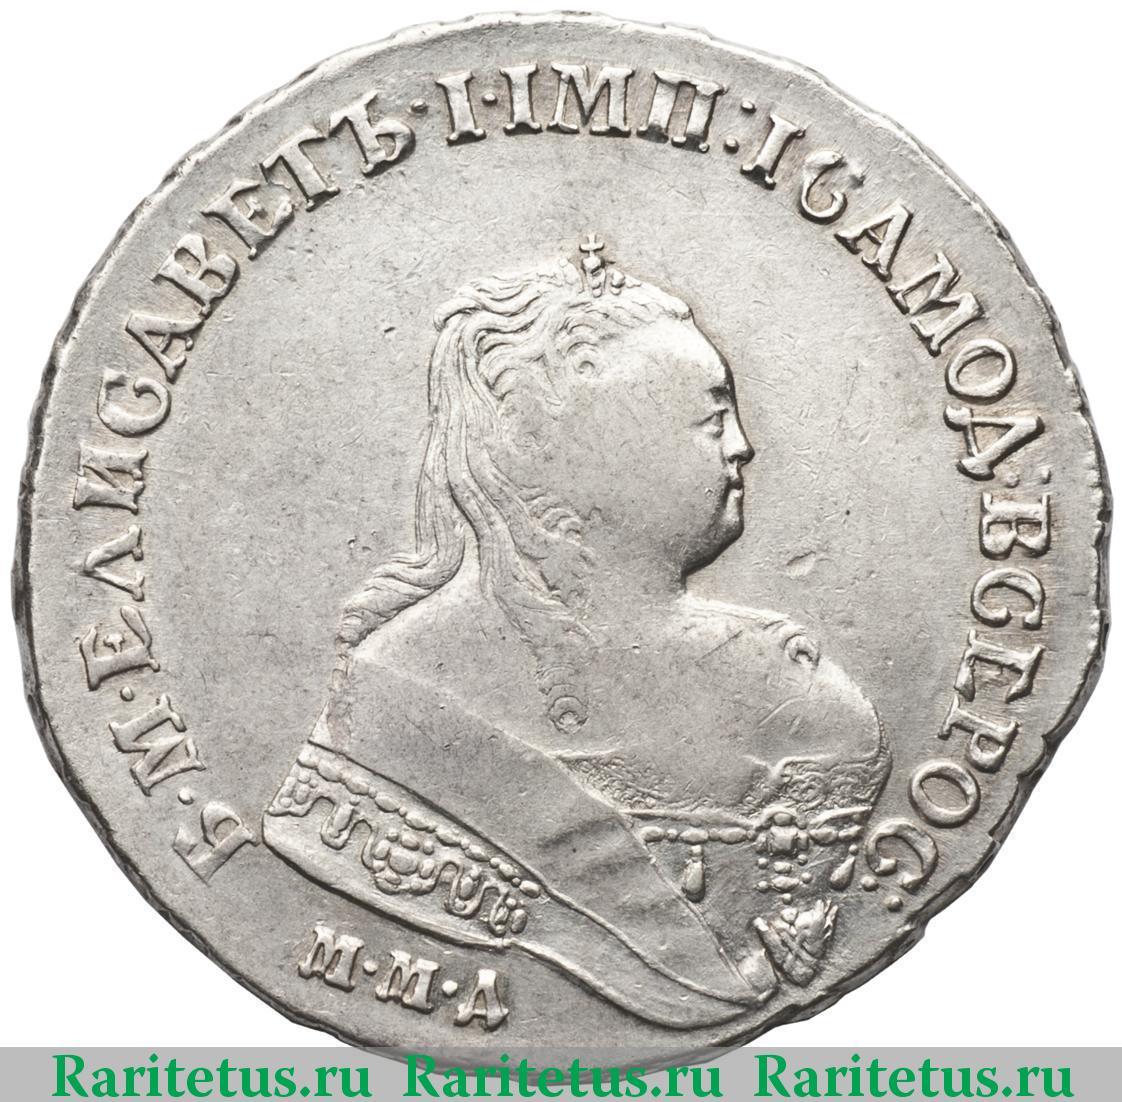 Аверс монеты 1 рубль 1753 года ММД-IШ